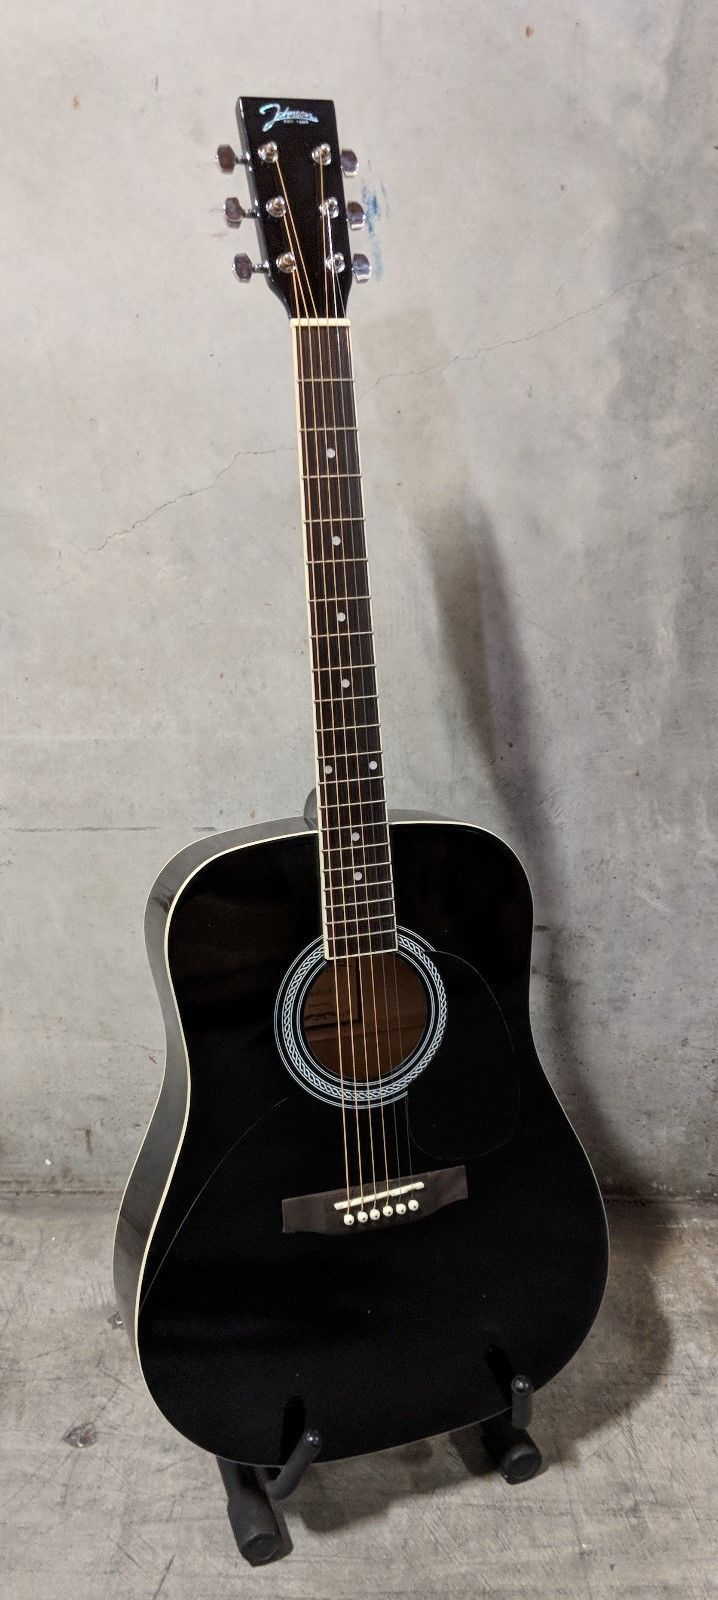 #guitar Johnson JG-610-B 610 Player Series Acoustic Guitar, Black please retweet